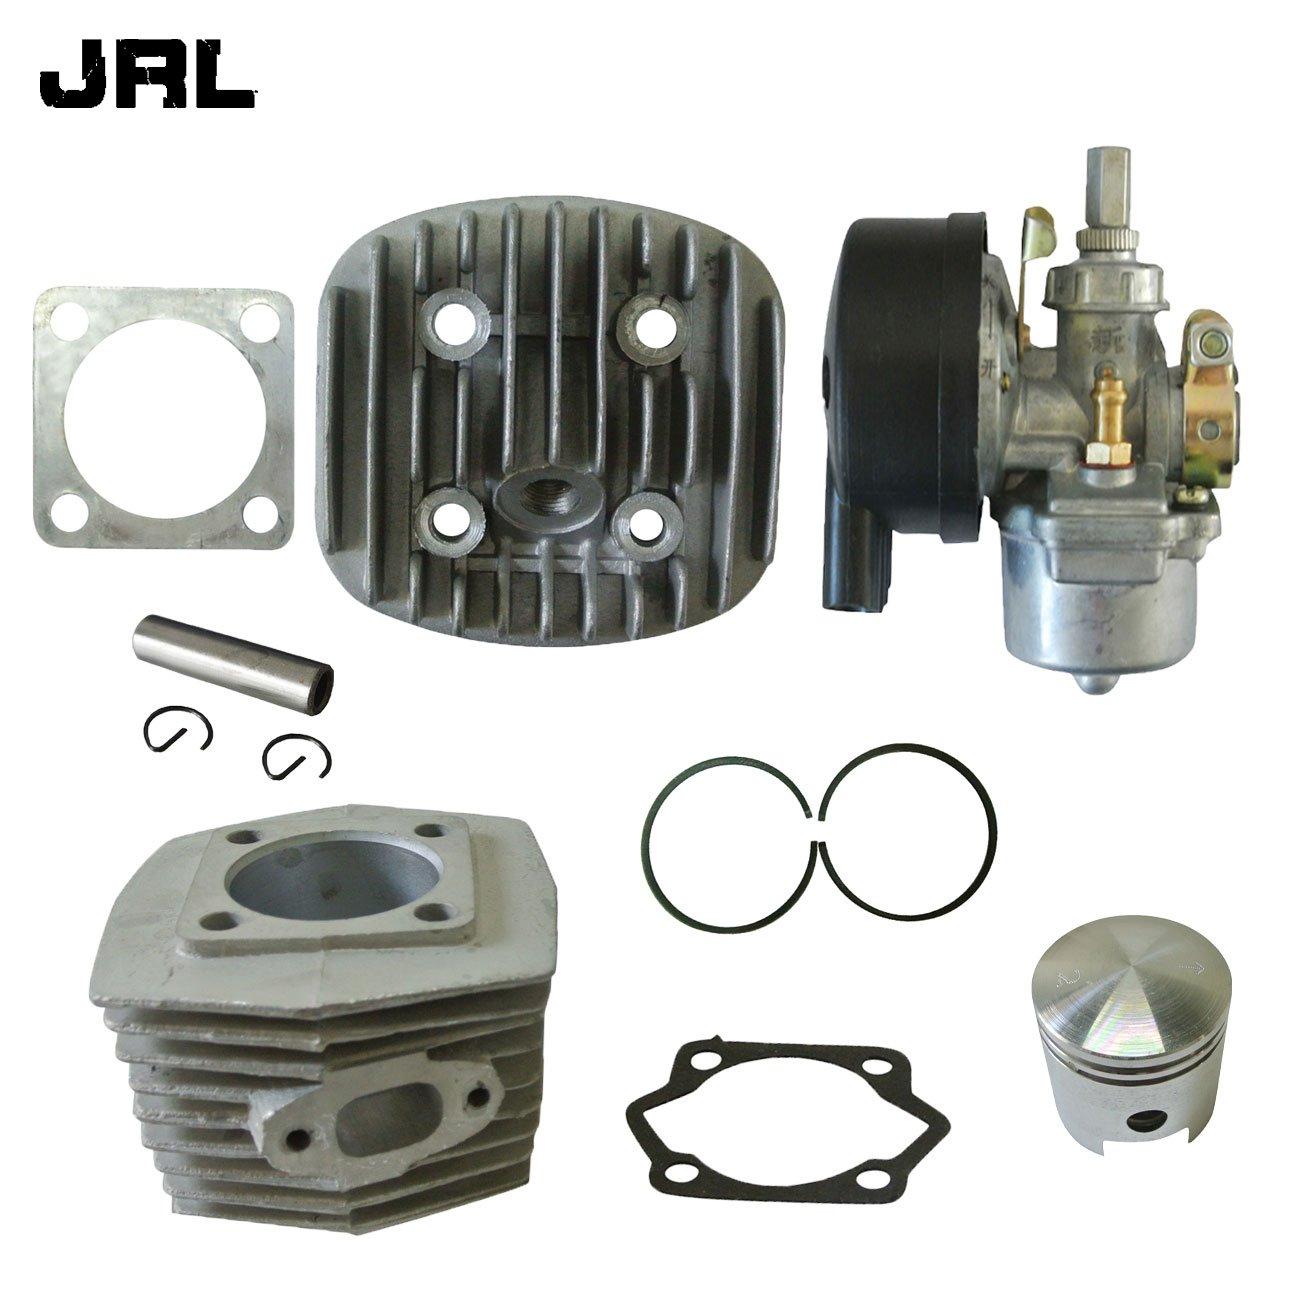 JRL Cylinder Head&Cylinder&Carburetor Fits 66/80cc 2 Stroke Engine Motorized Bicycle Nantong Power